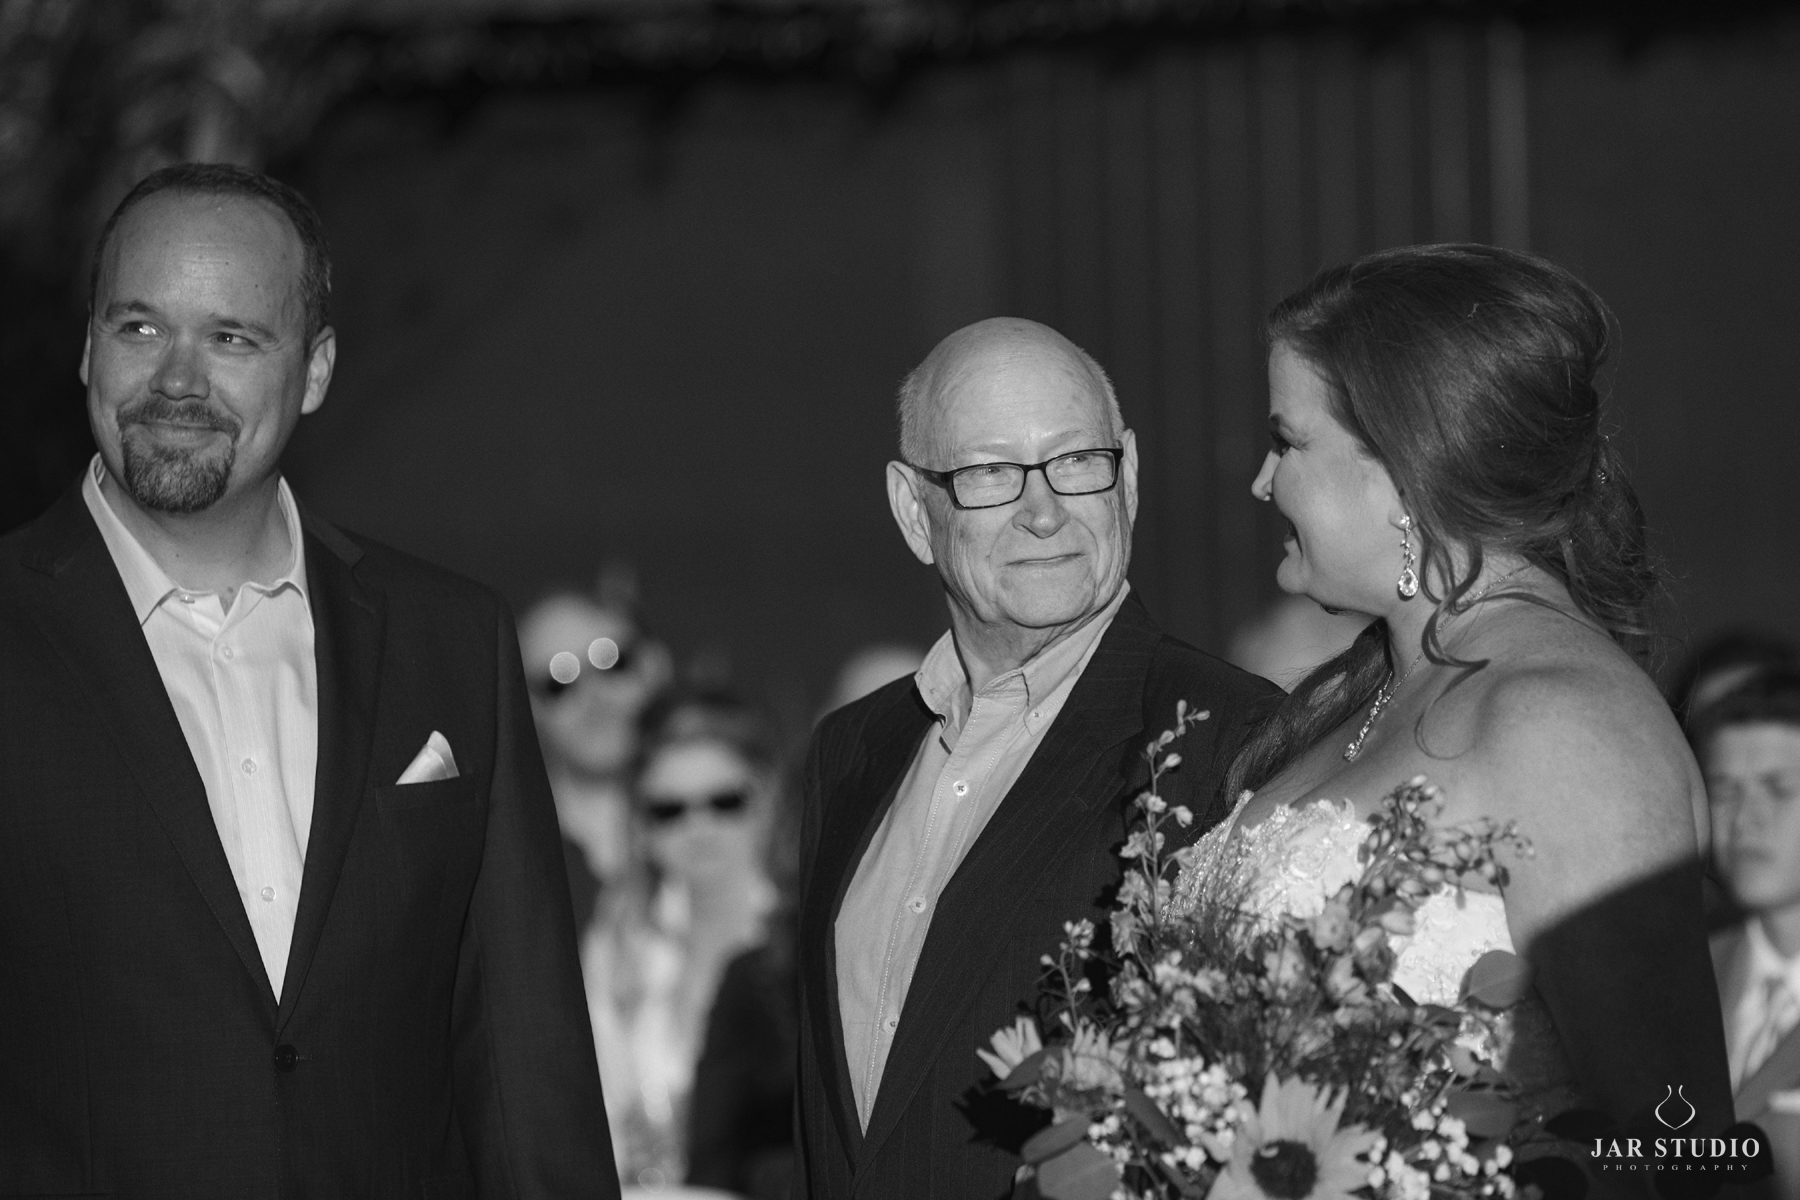 18-father-giving-bride-away-beautiful-moment-jarstudio.JPG